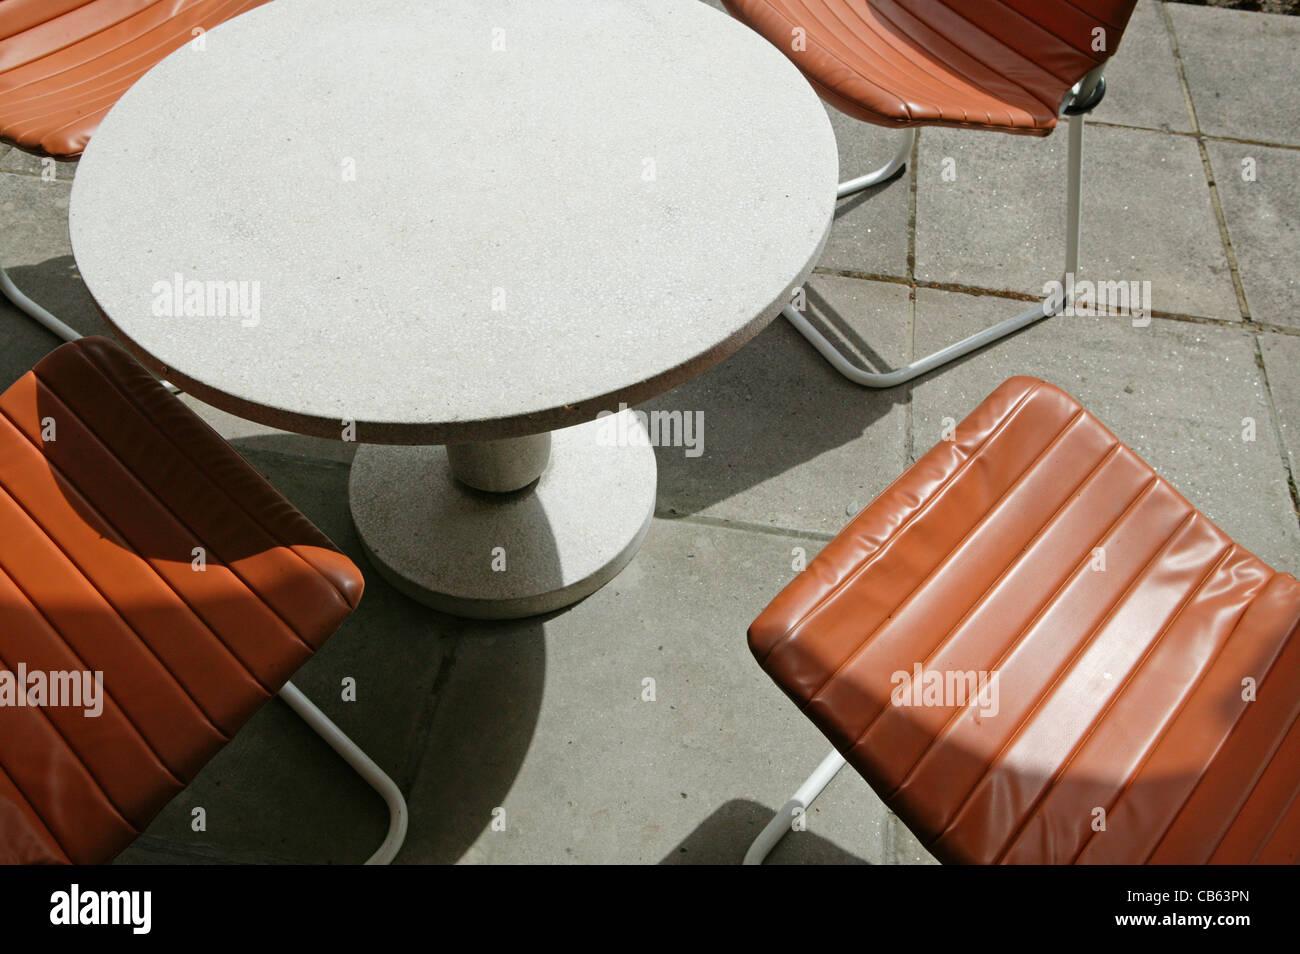 Funky garden furniture Stock Photo - Alamy